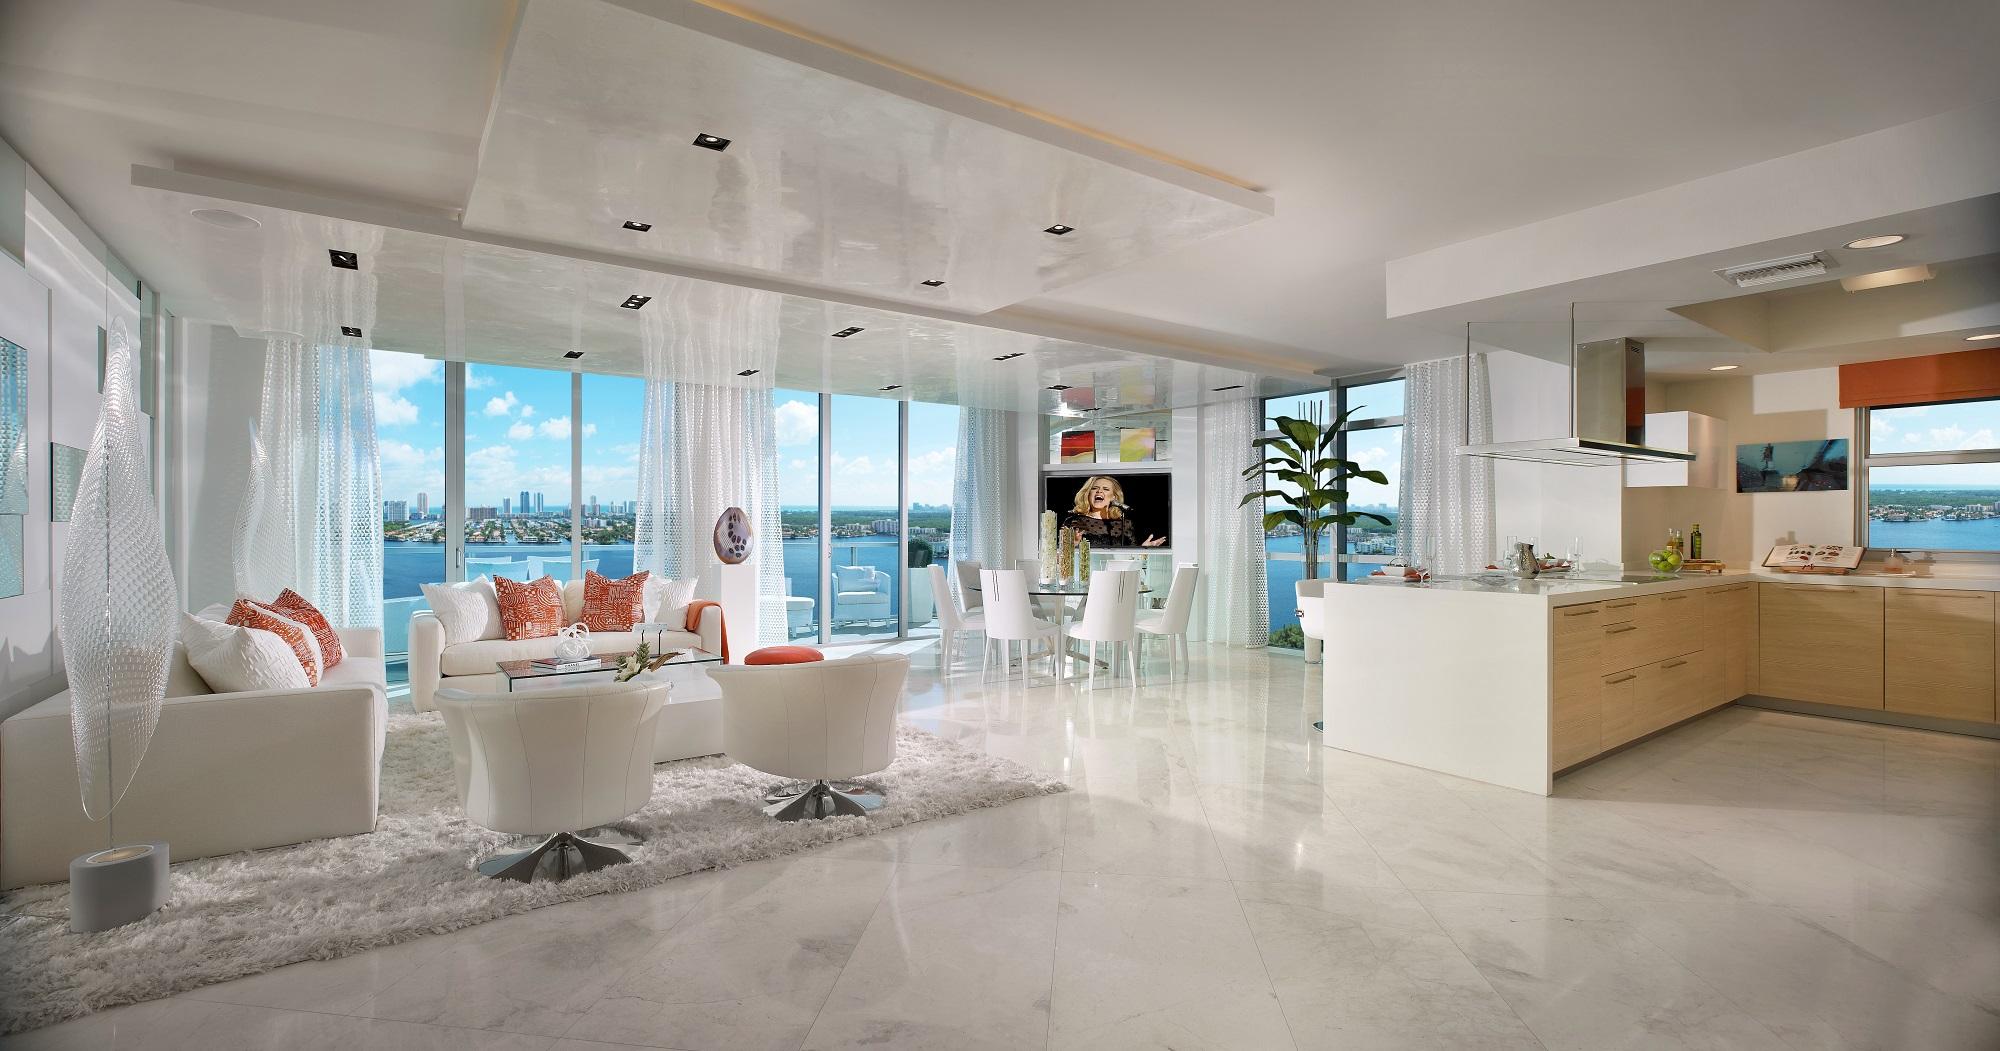 Luxury South Florida Condo Overcomes Foreclosure Zoning